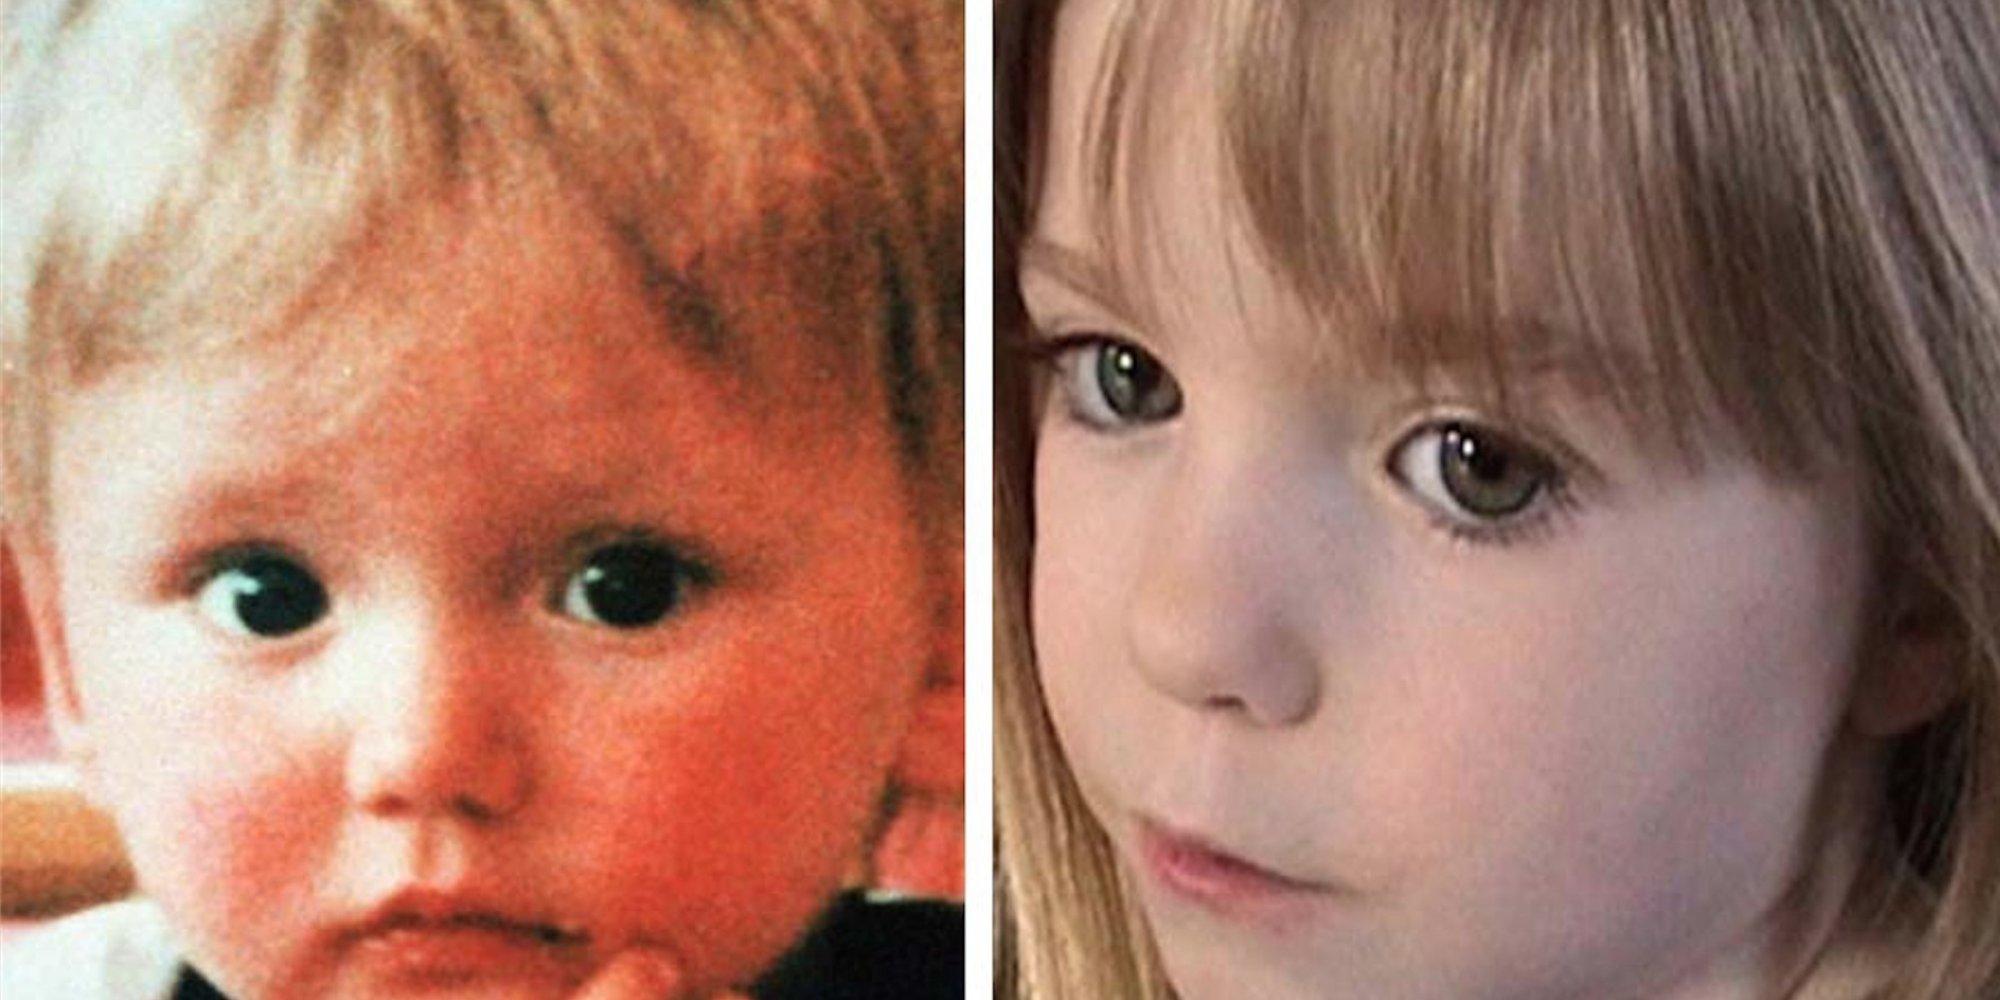 Madeleine McCann Facebook: Madeleine McCann Parents Close Twitter Account 'After